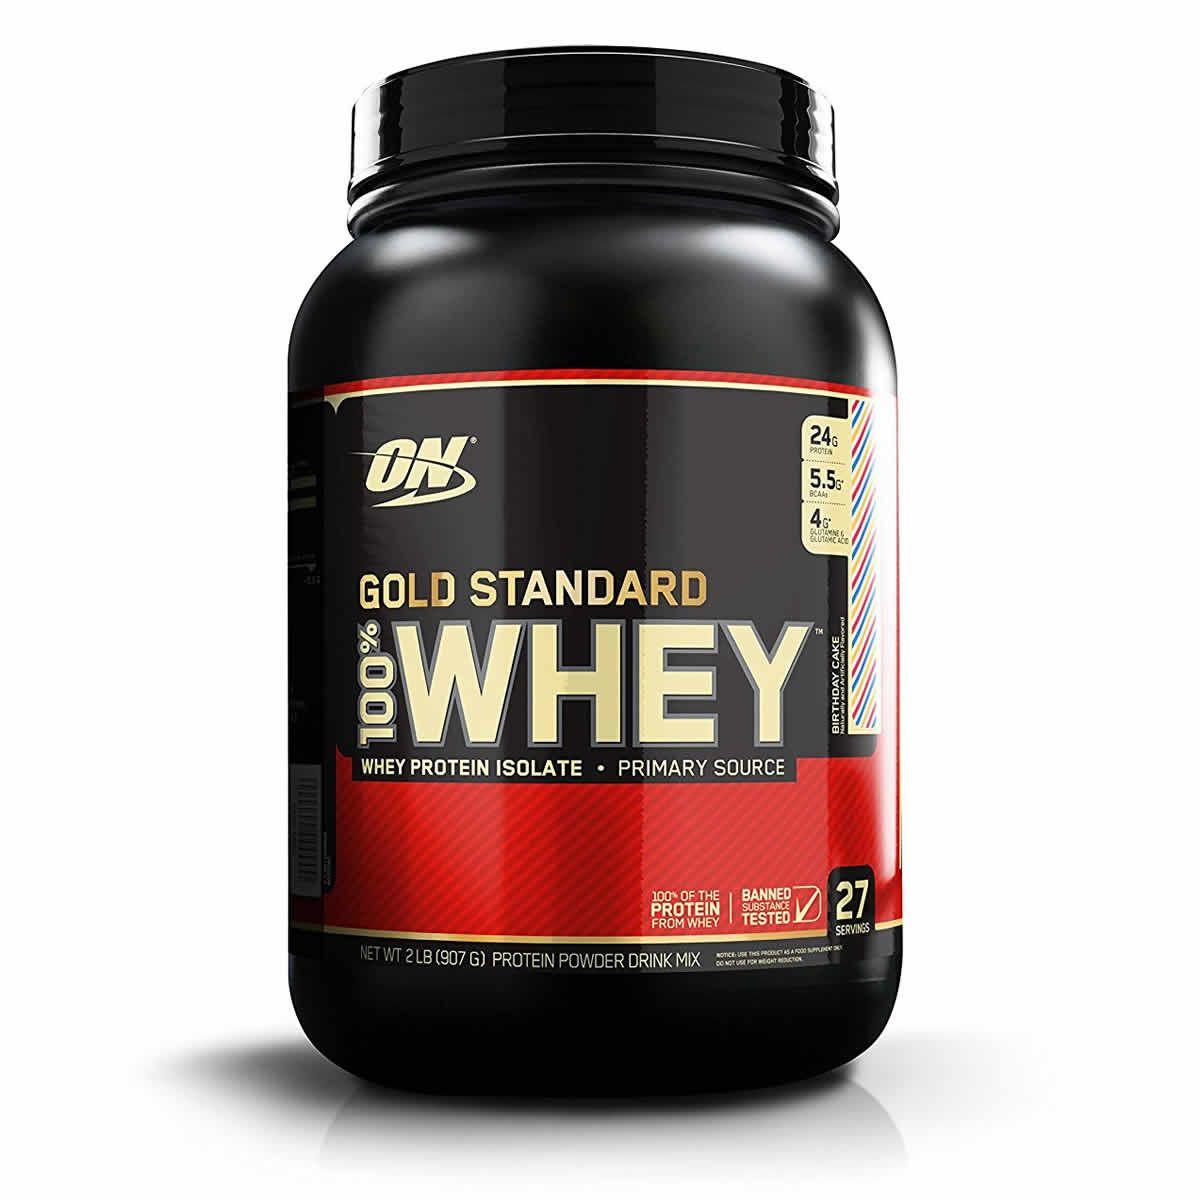 Optimum Nutrition Gold Standard 100 Whey Protein Powder 2 Lbs Gold Standard Whey Gold Standard Whey Protein Best Whey Protein